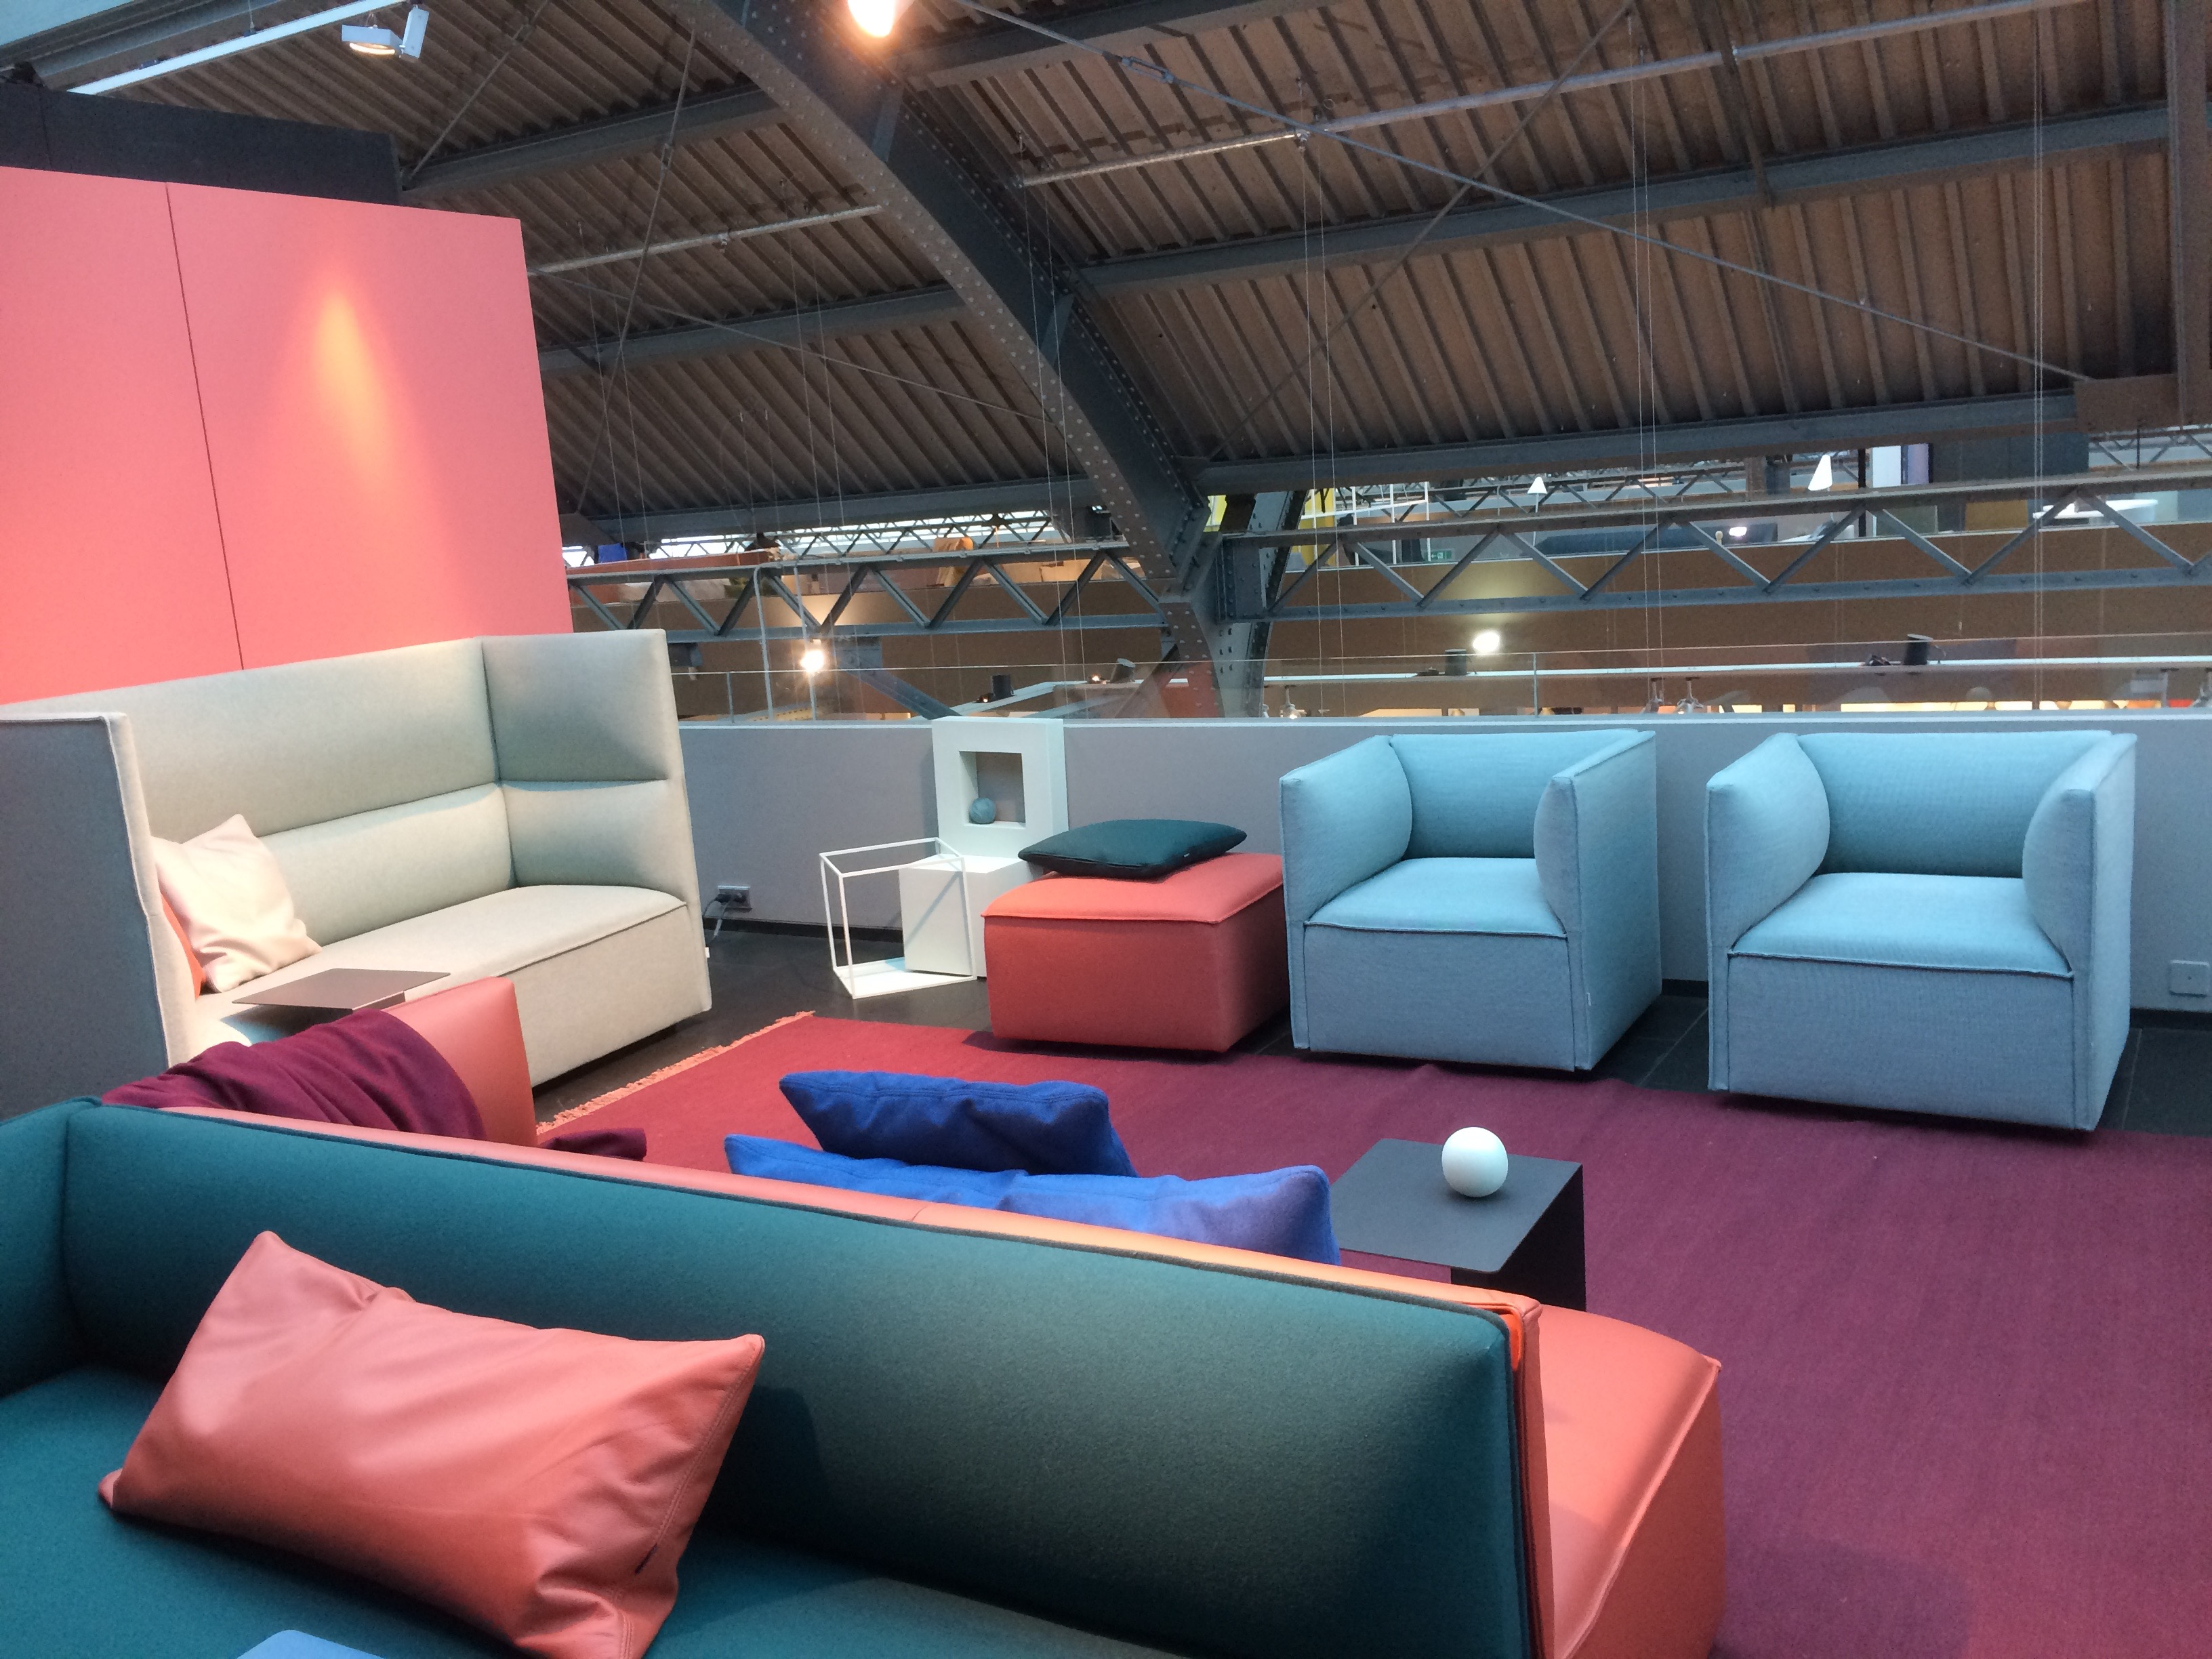 Lex Pott Bank Fauteuil Pillow 8740 IMMCologne Gelderland Foto Lisette Gimmii